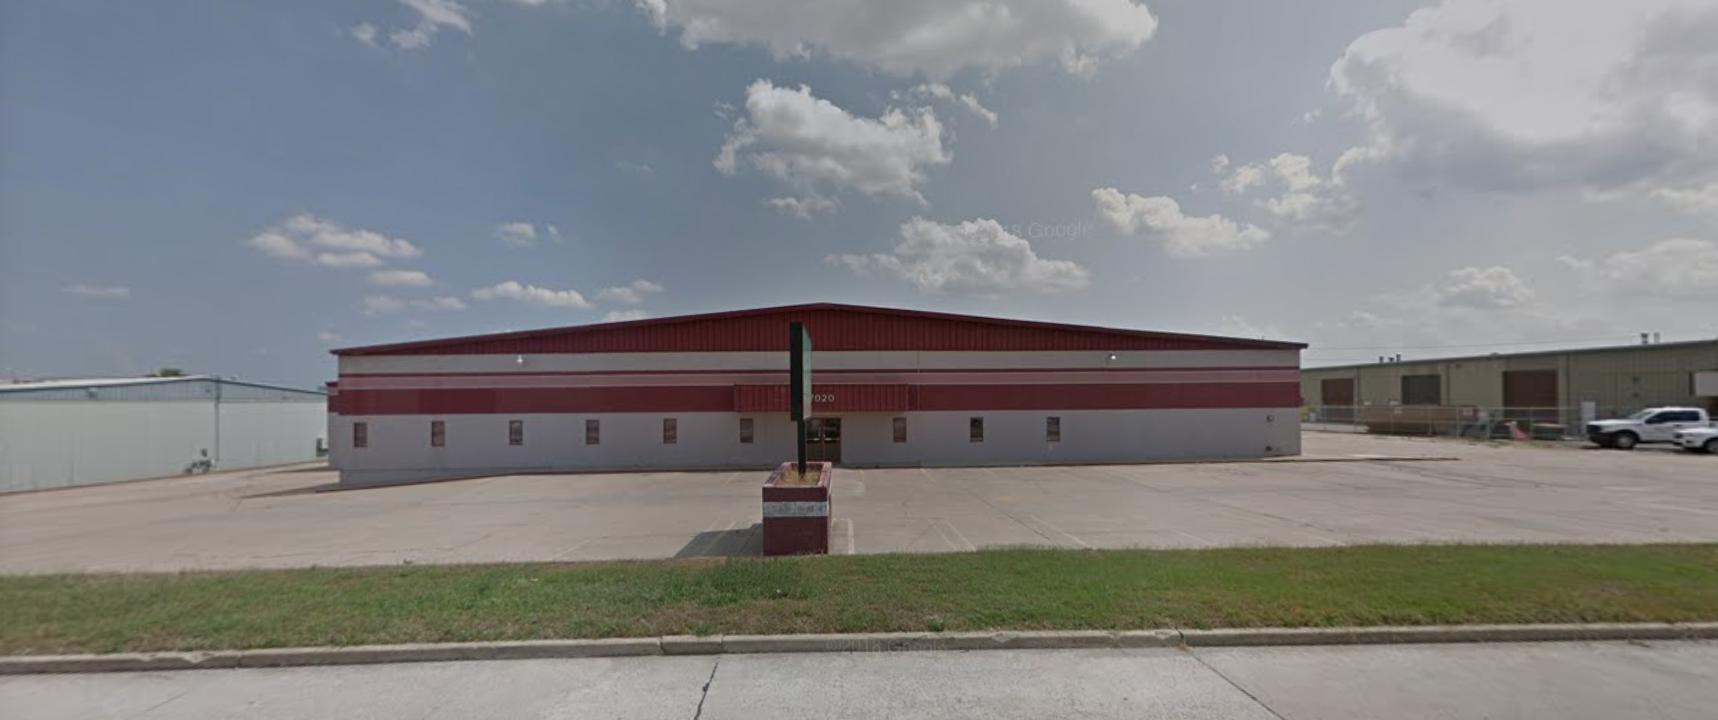 AIM High Academy's new home at Tulsa World of Gymnastics